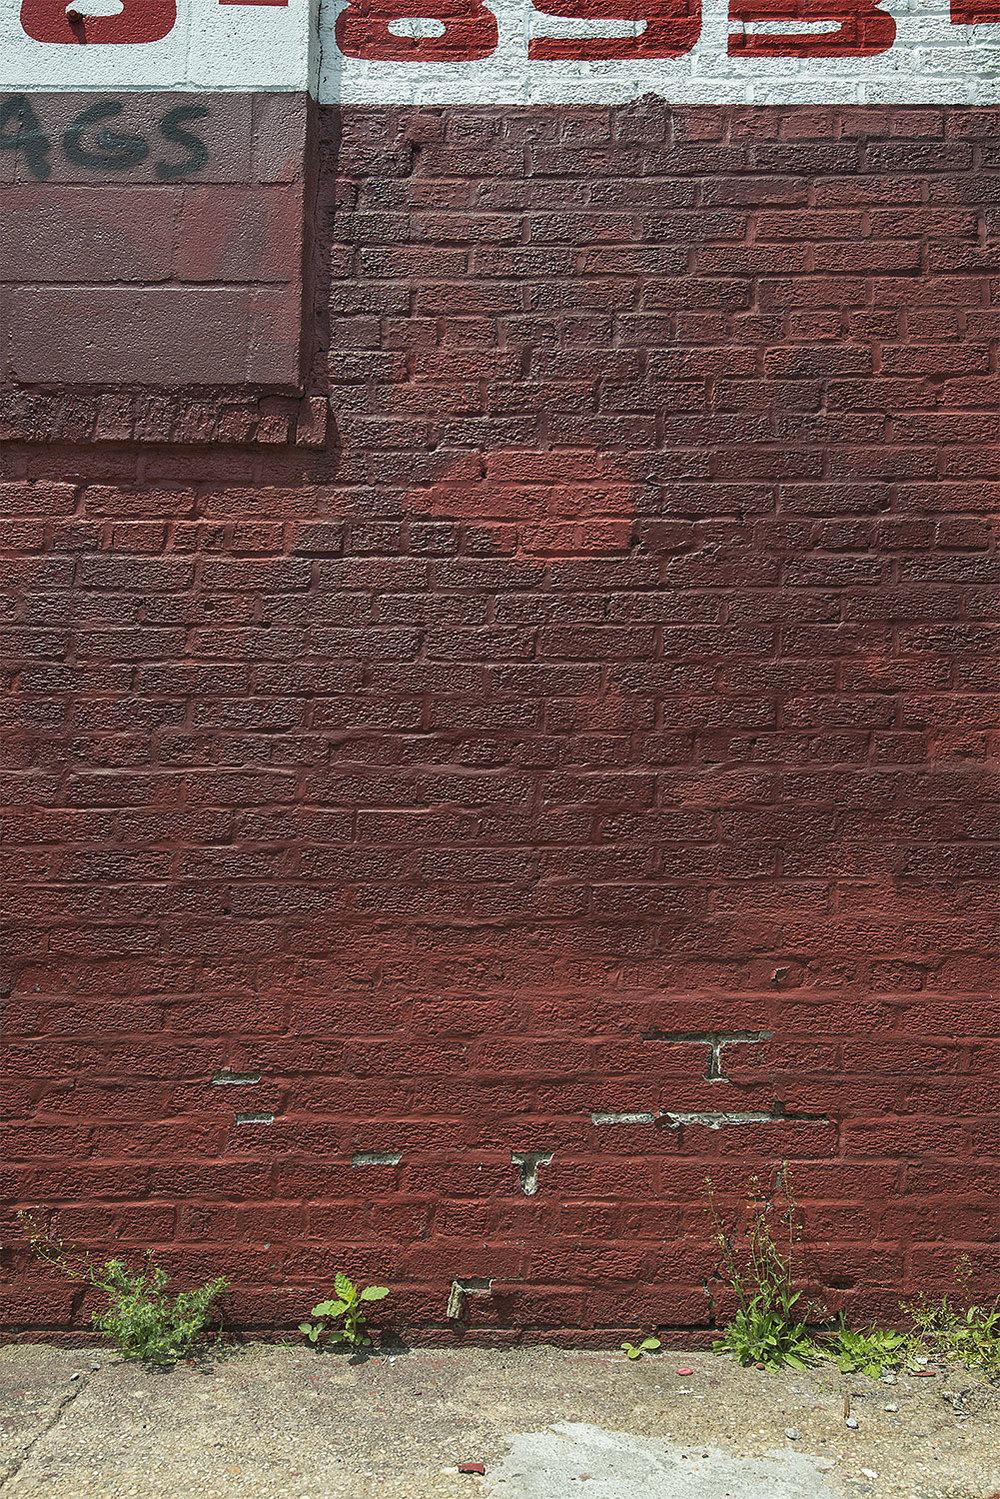 uncult_Bronx_14.06.03-0944.jpg